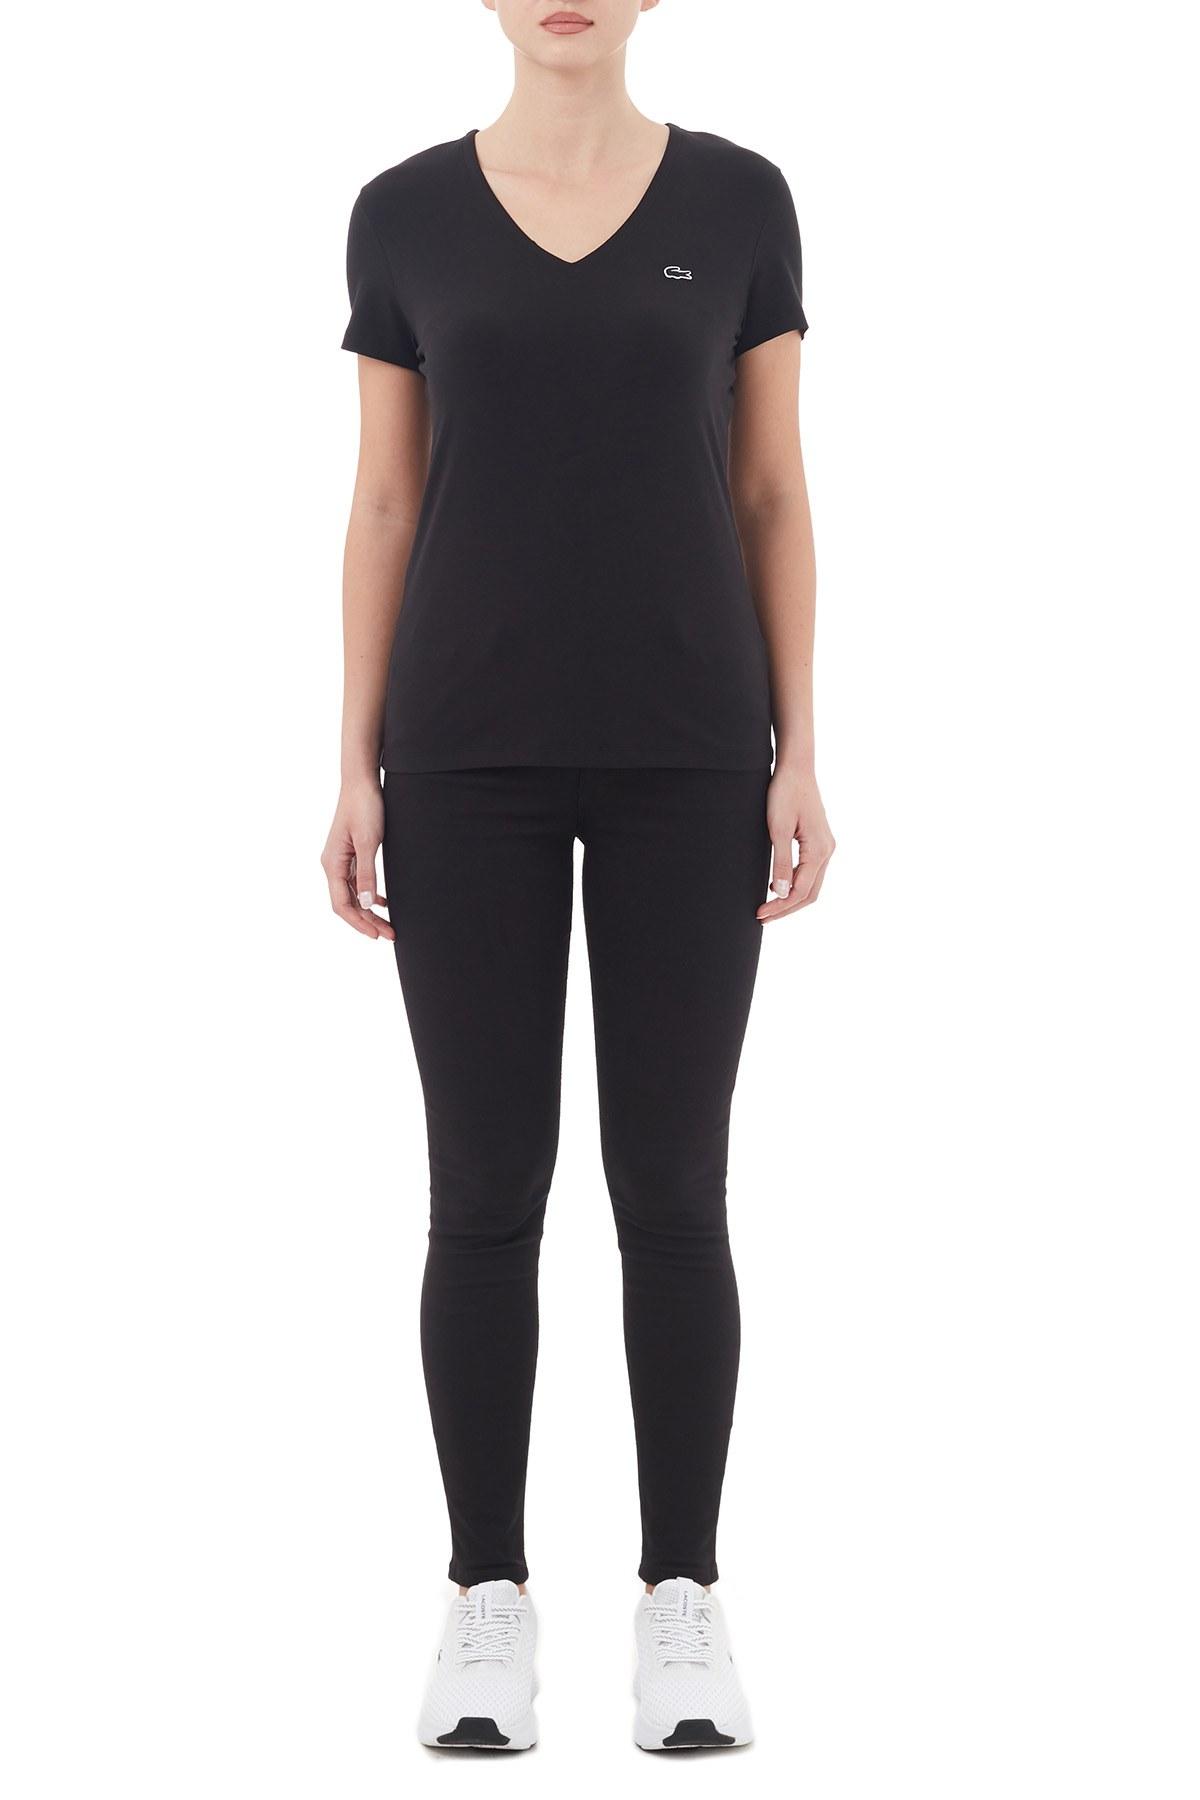 Lacoste V Yaka Pamuklu Kadın T Shirt TF0999 031 SİYAH